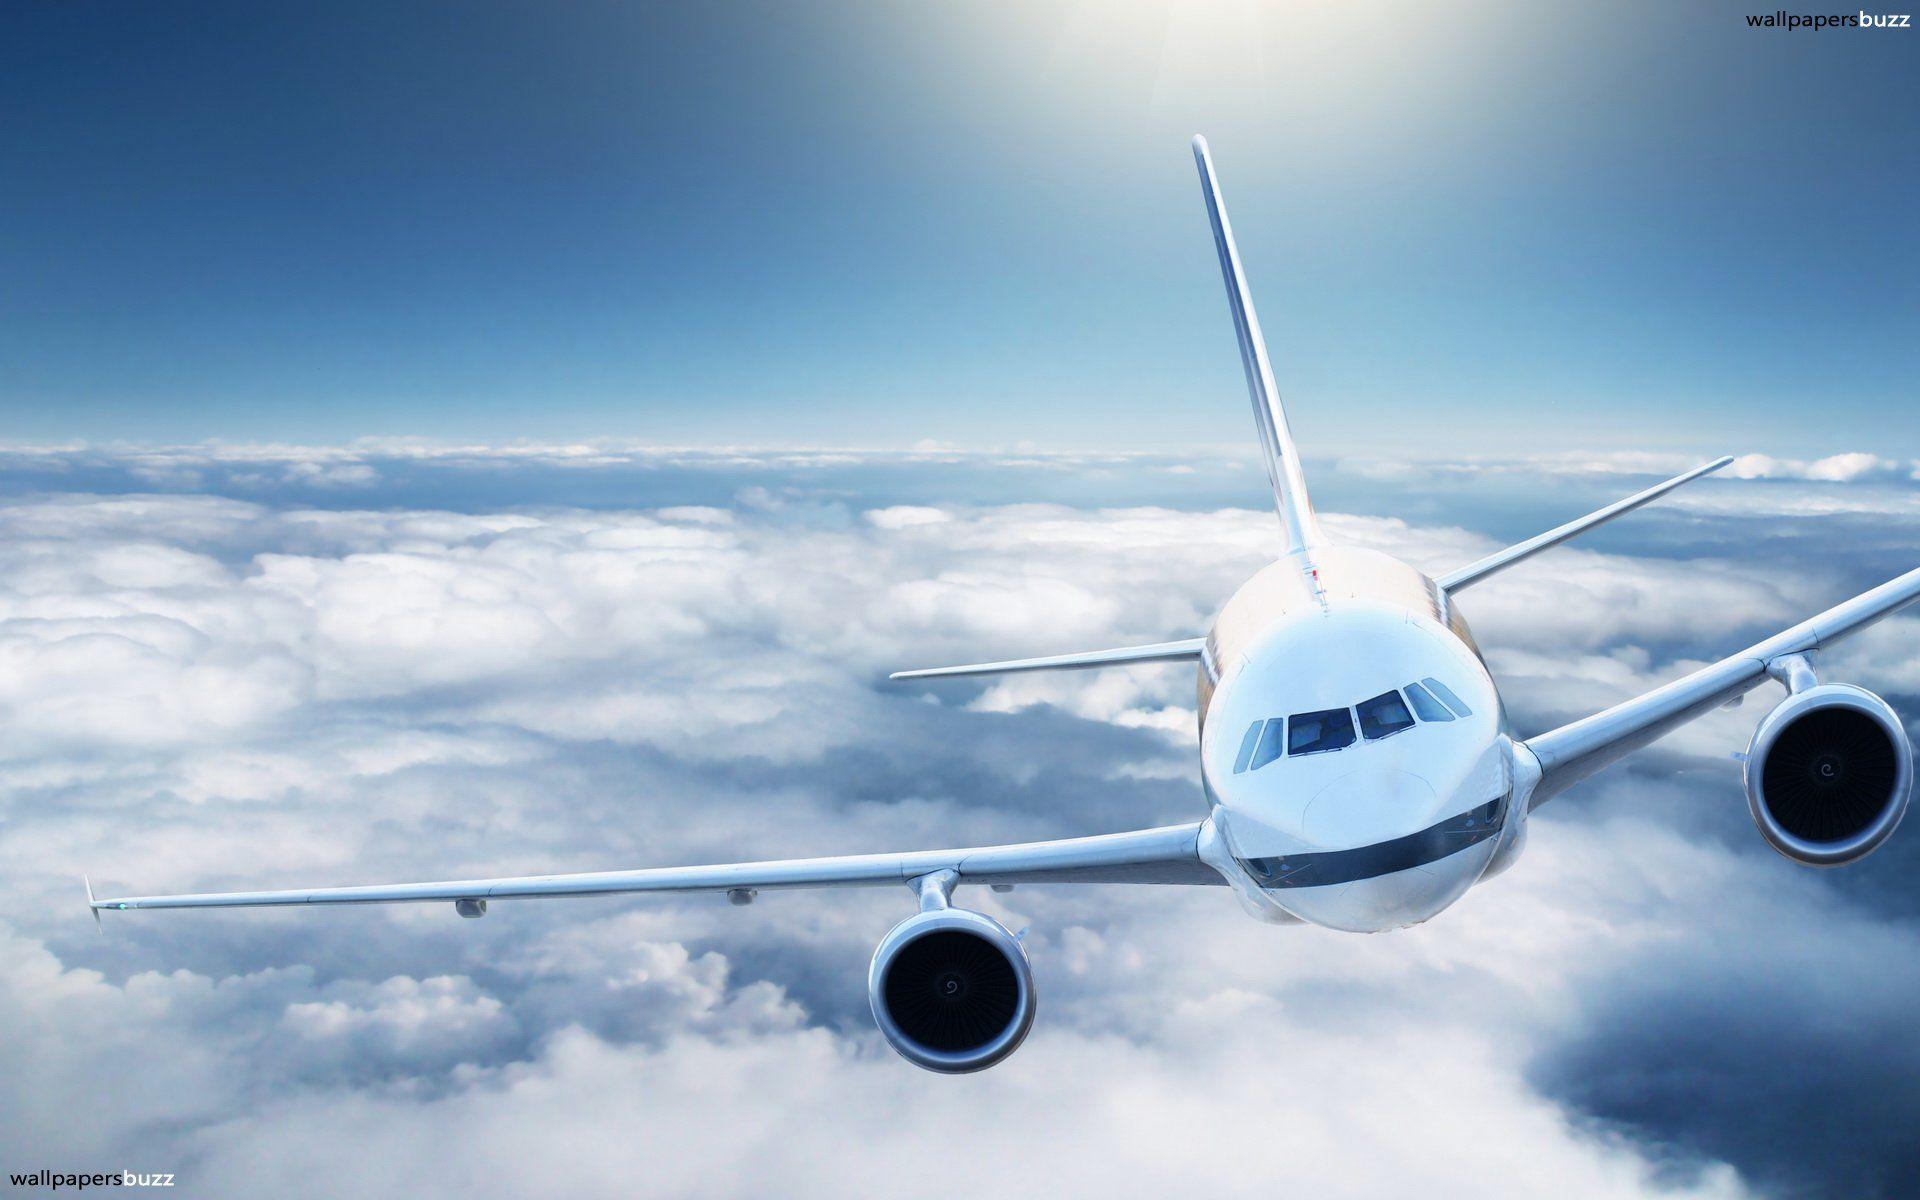 Aeroplane Wallpaper Airline Booking Cheap Flight Tickets